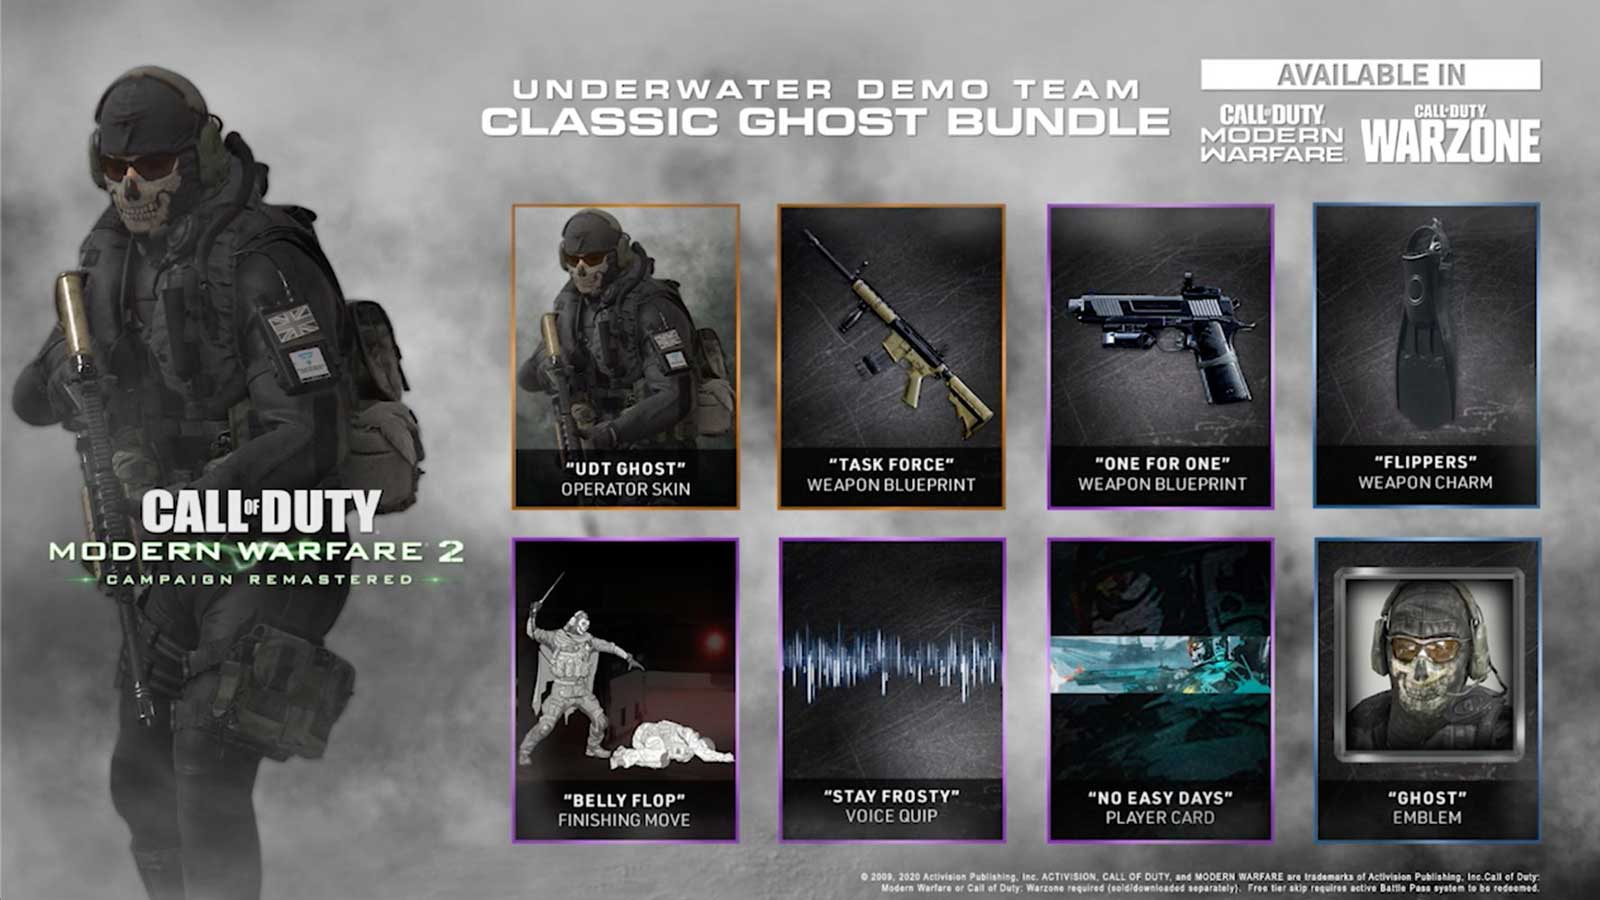 underwater demo team classic ghost bundle babt